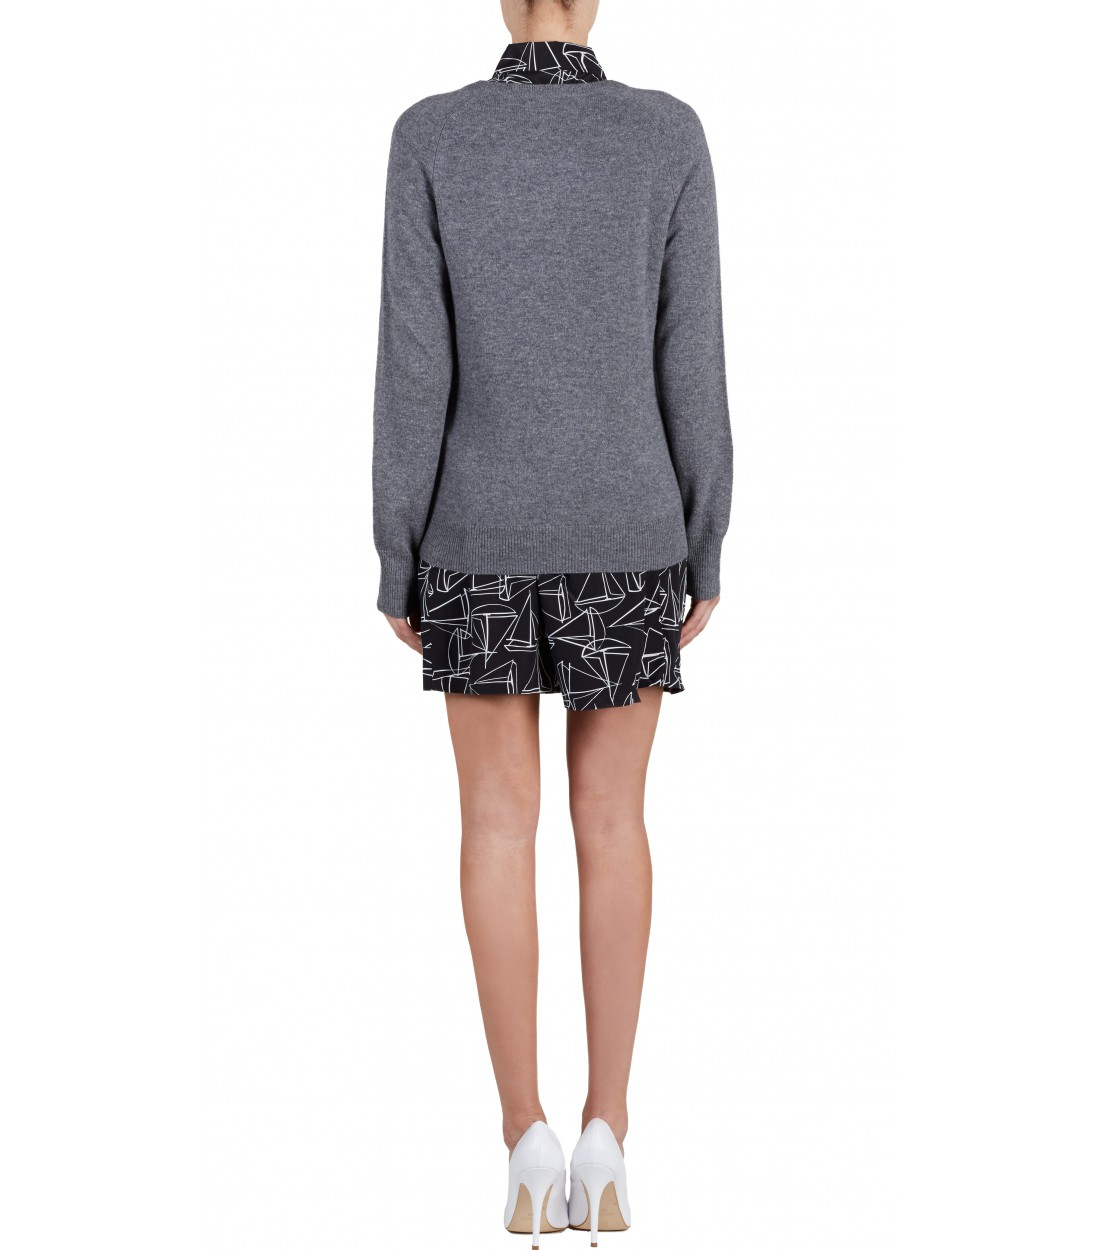 EQUIPMENT Sloane Crewneck Heather Grey | Women's Cashmere Sweater